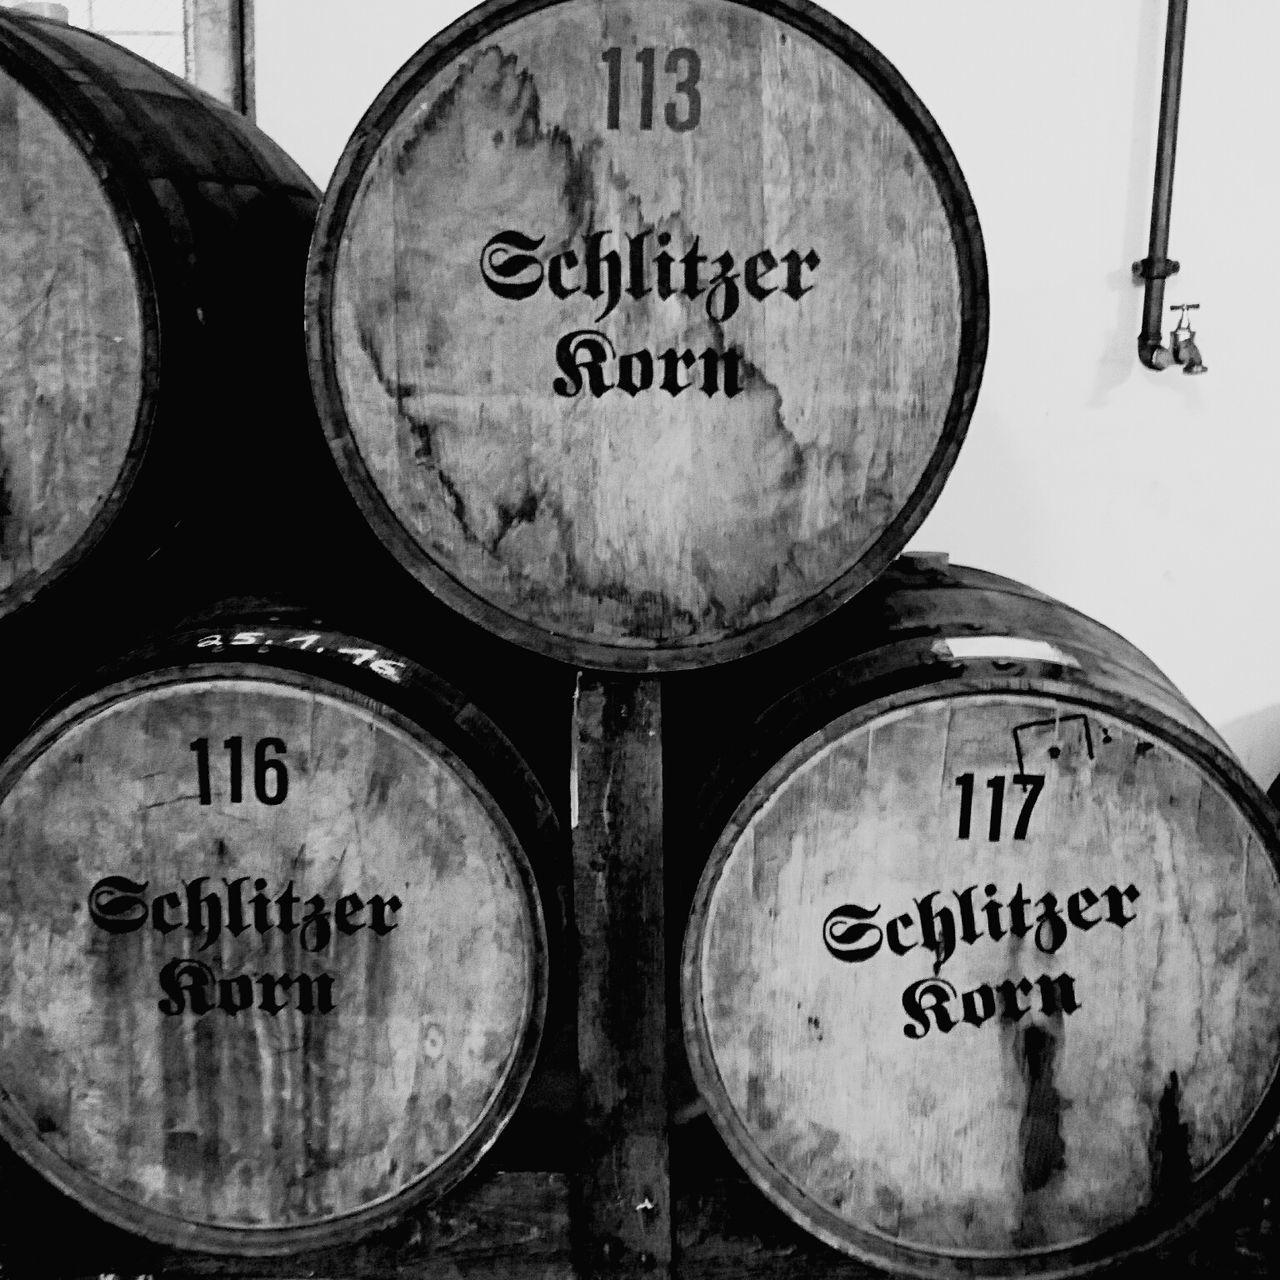 Schlitz Korn Schnaps Beverage Cask Fass Destillery